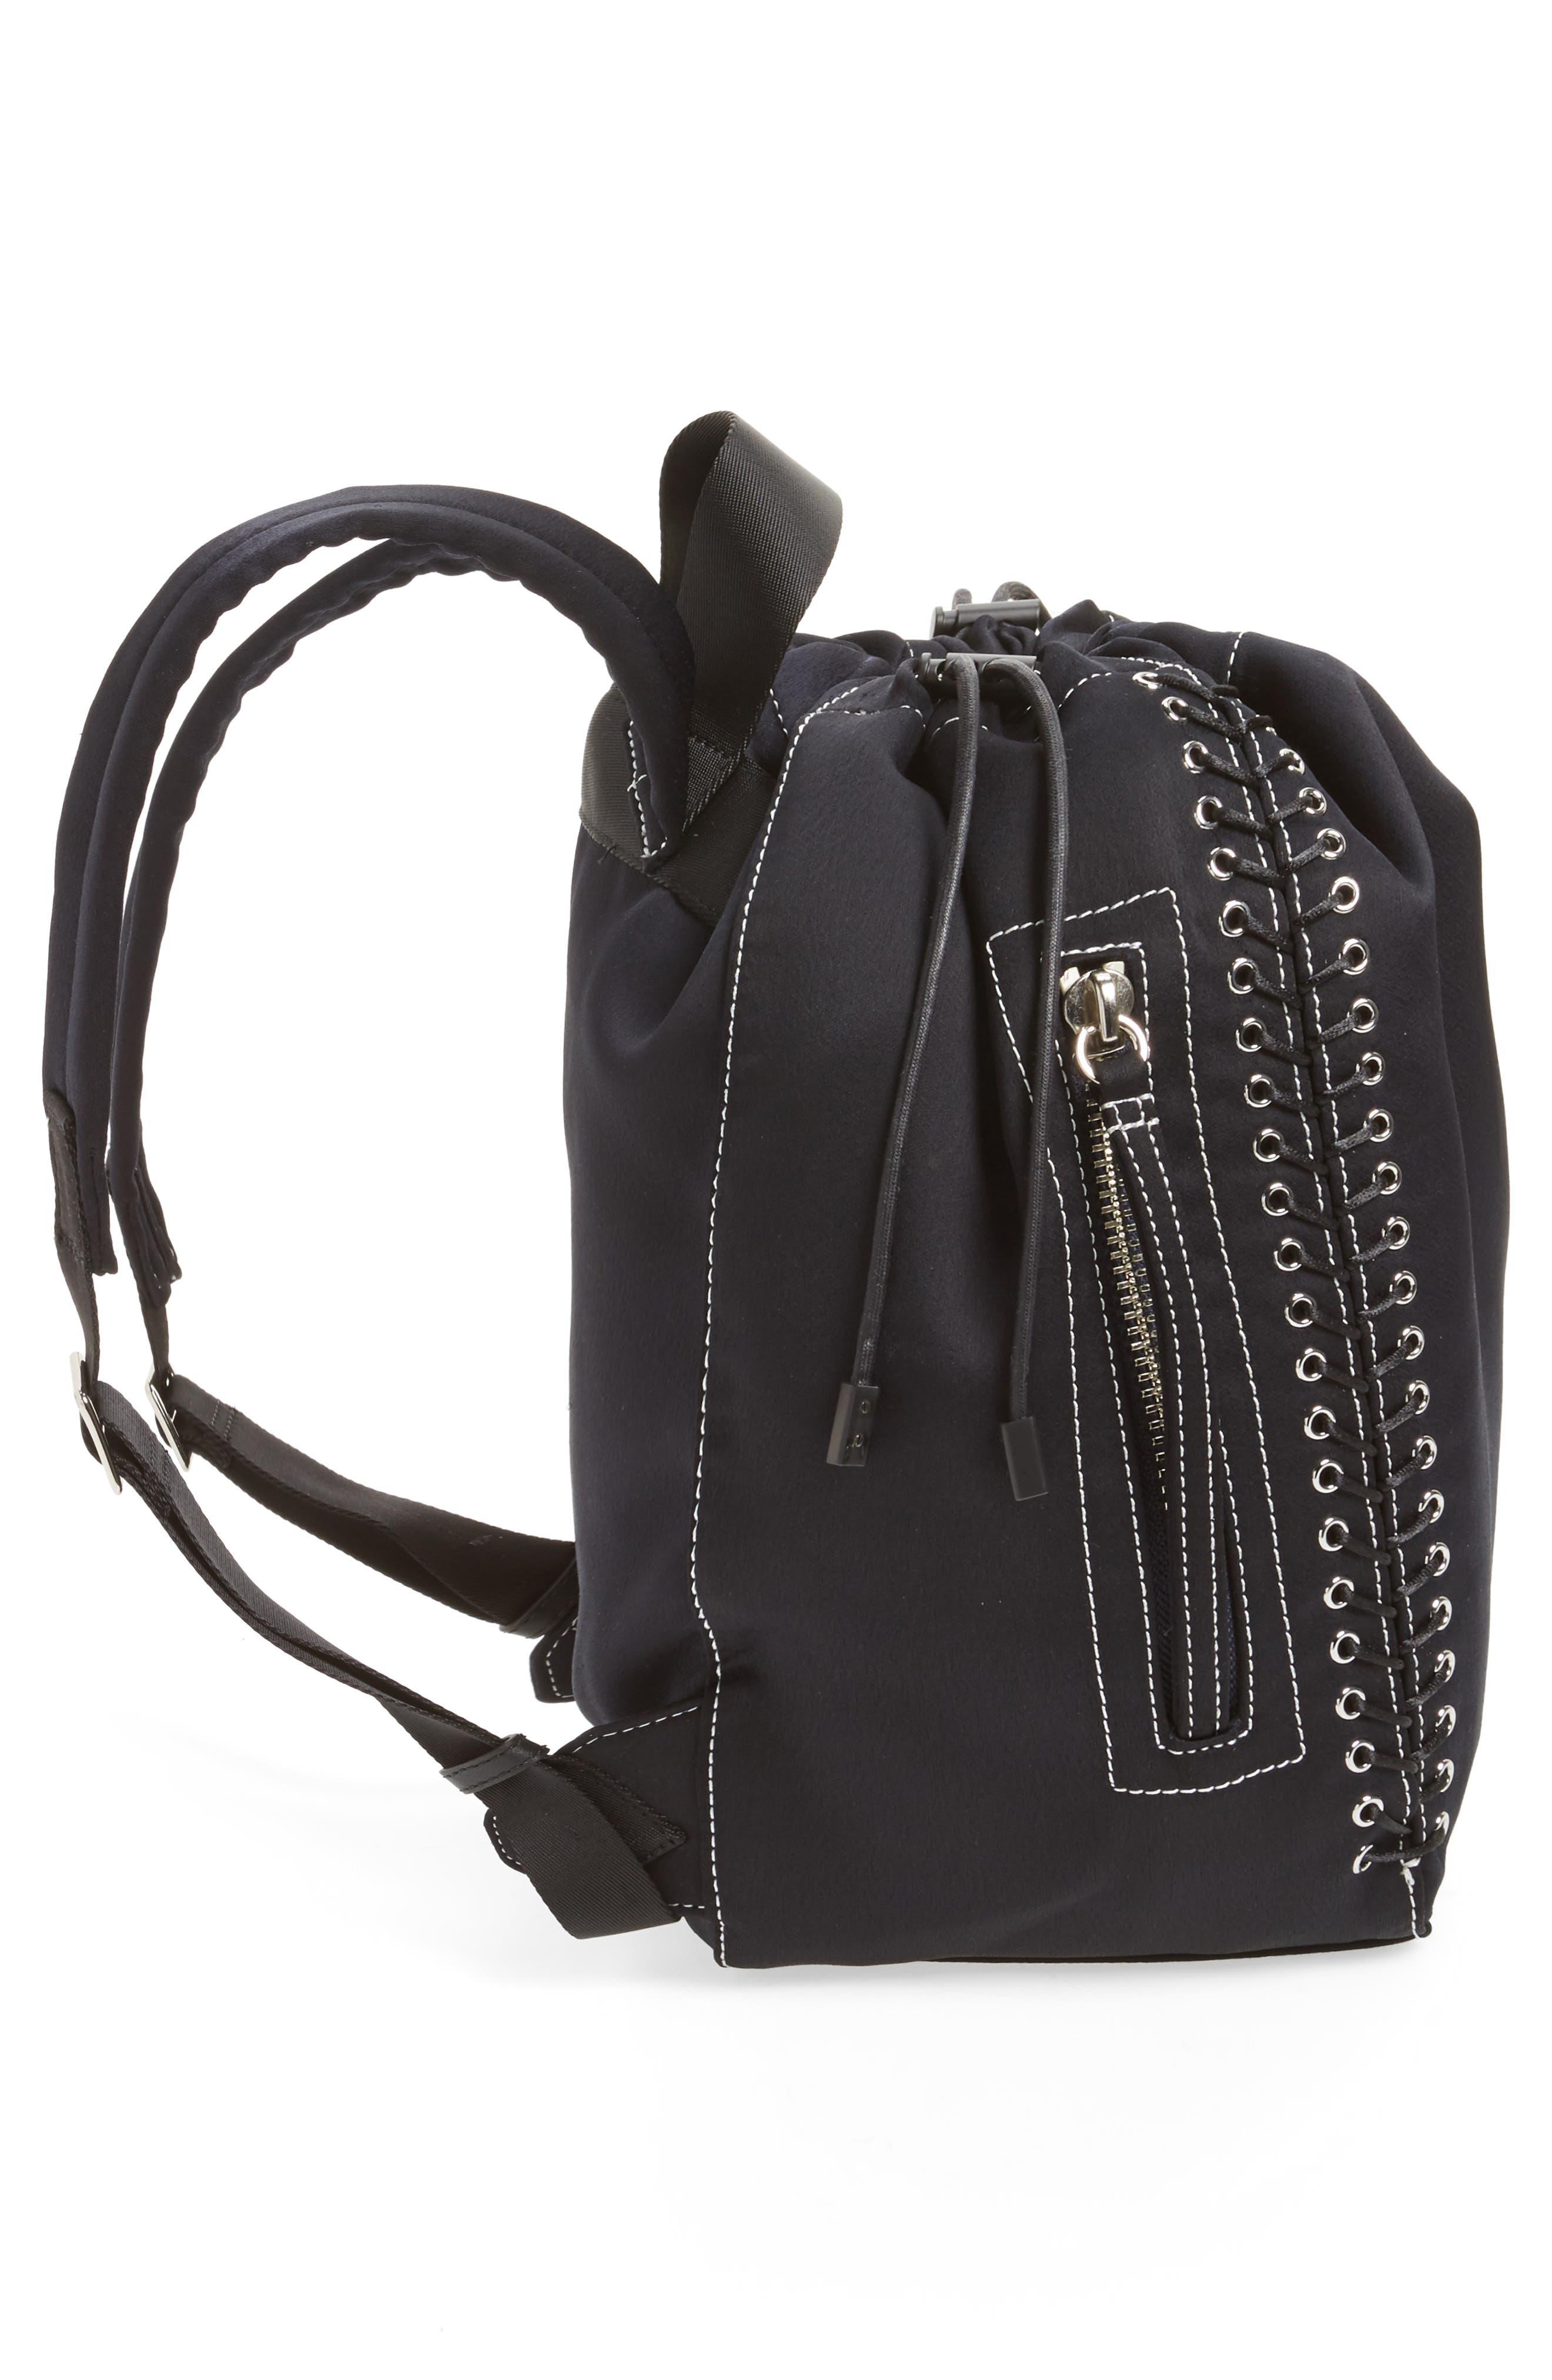 Phillip Lim 3.1 Medium Go-Go Lace-Up Backpack,                             Alternate thumbnail 5, color,                             420